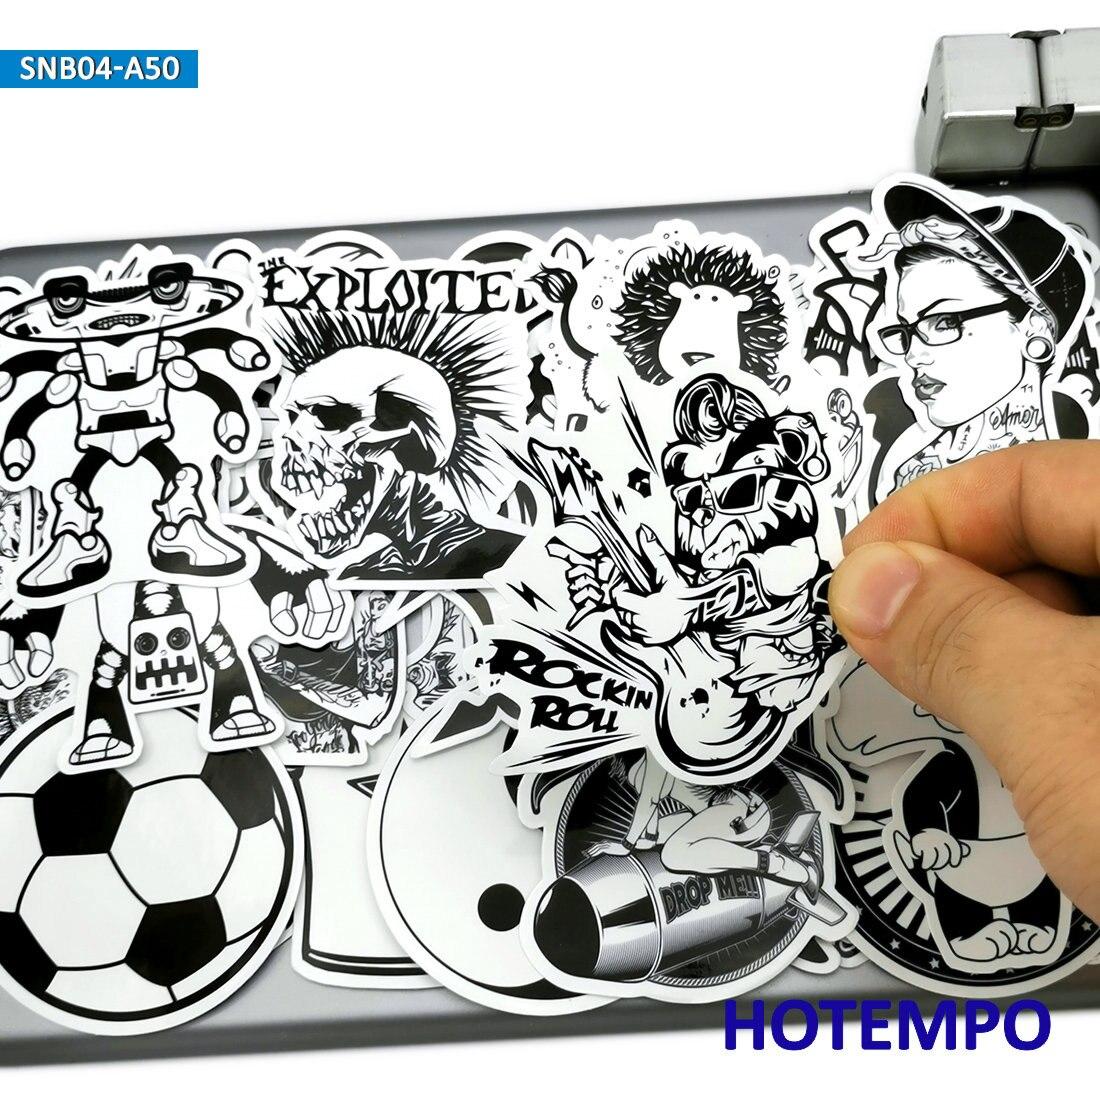 50pcs Graffiti Mix Funny Fashion Black And White Stickers For Mobile Phone Laptop Luggage Skateboard Bike Car Art Style Stickers